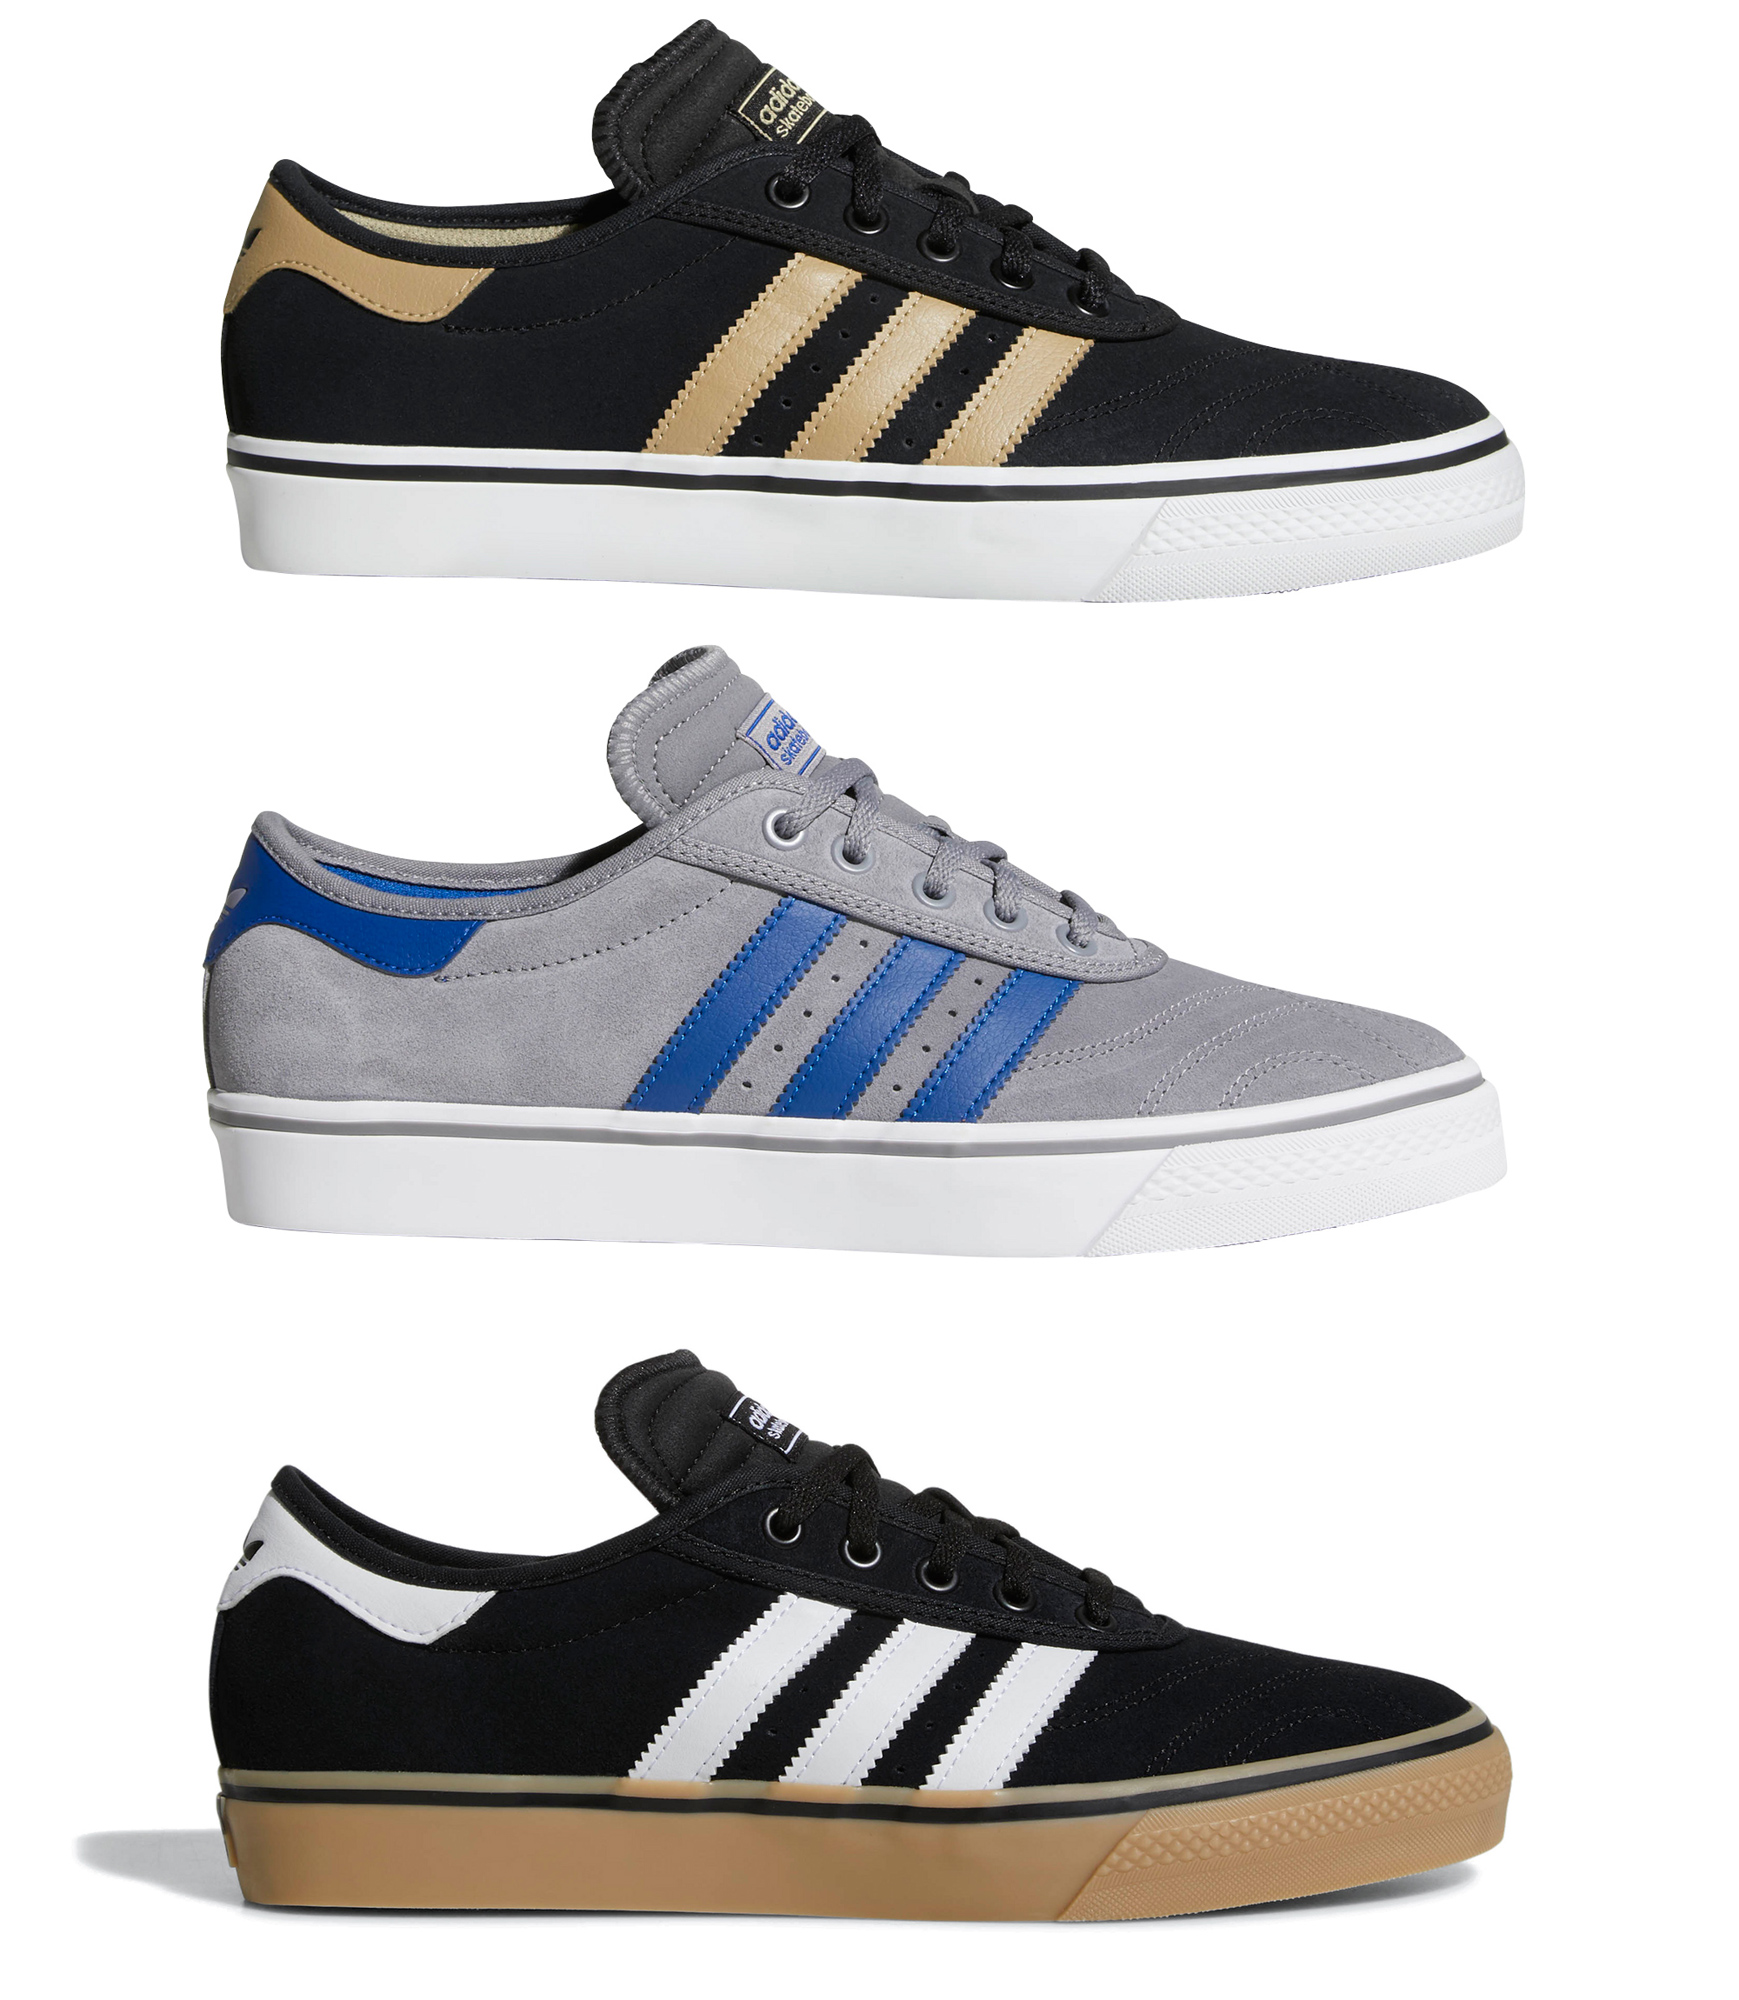 1e1020ff386485 Sentinel Adidas Skateboarding - Adi-Ease Premiere - Skate Shoes